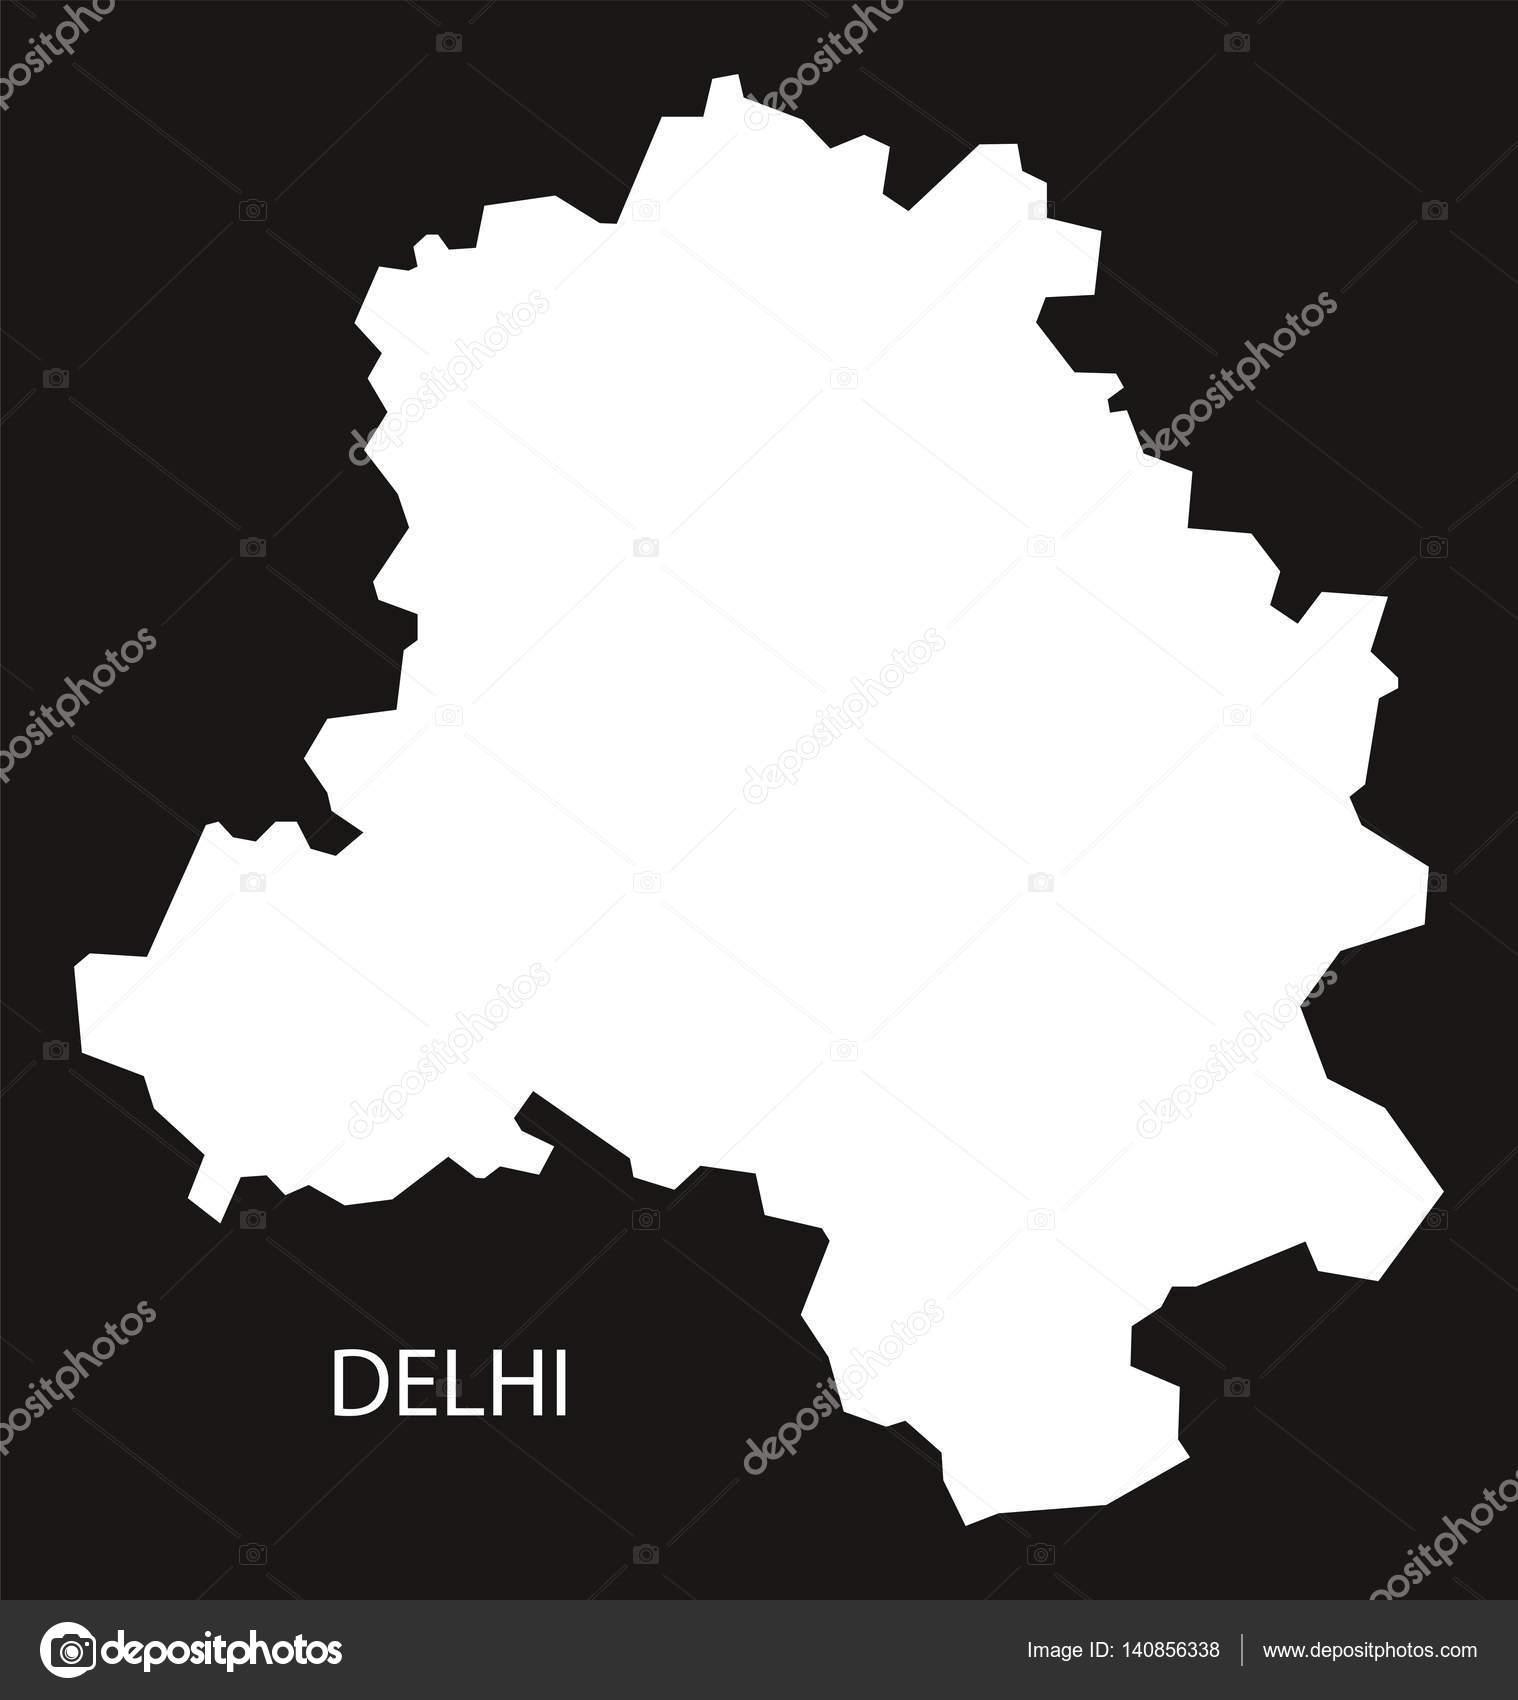 Delhi India Map Black Inverted Stock Vector C Ingomenhard 140856338